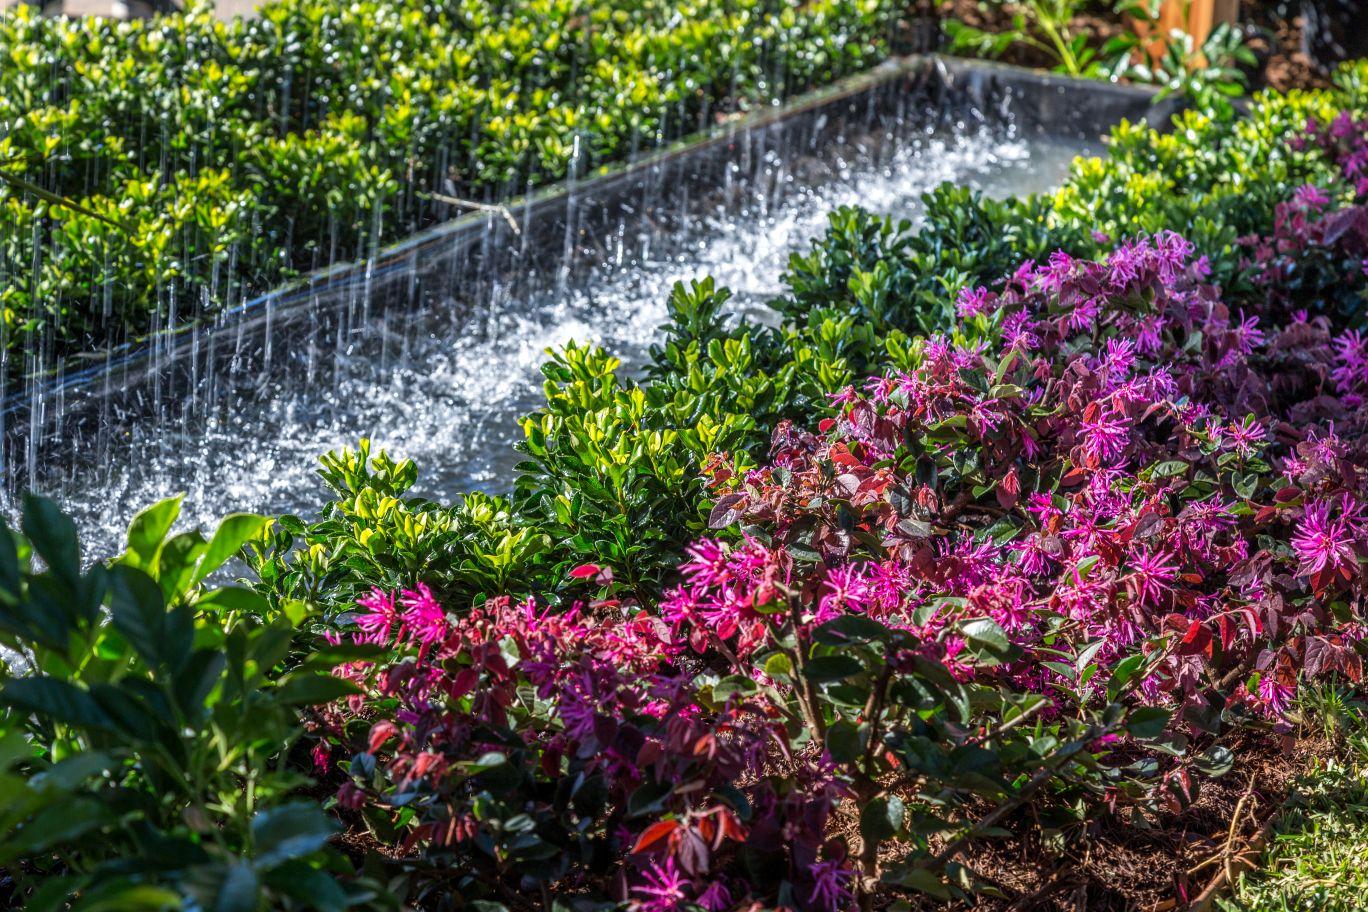 Odyssey Landscapes garden display at the 2019 Queensland Garden Expo